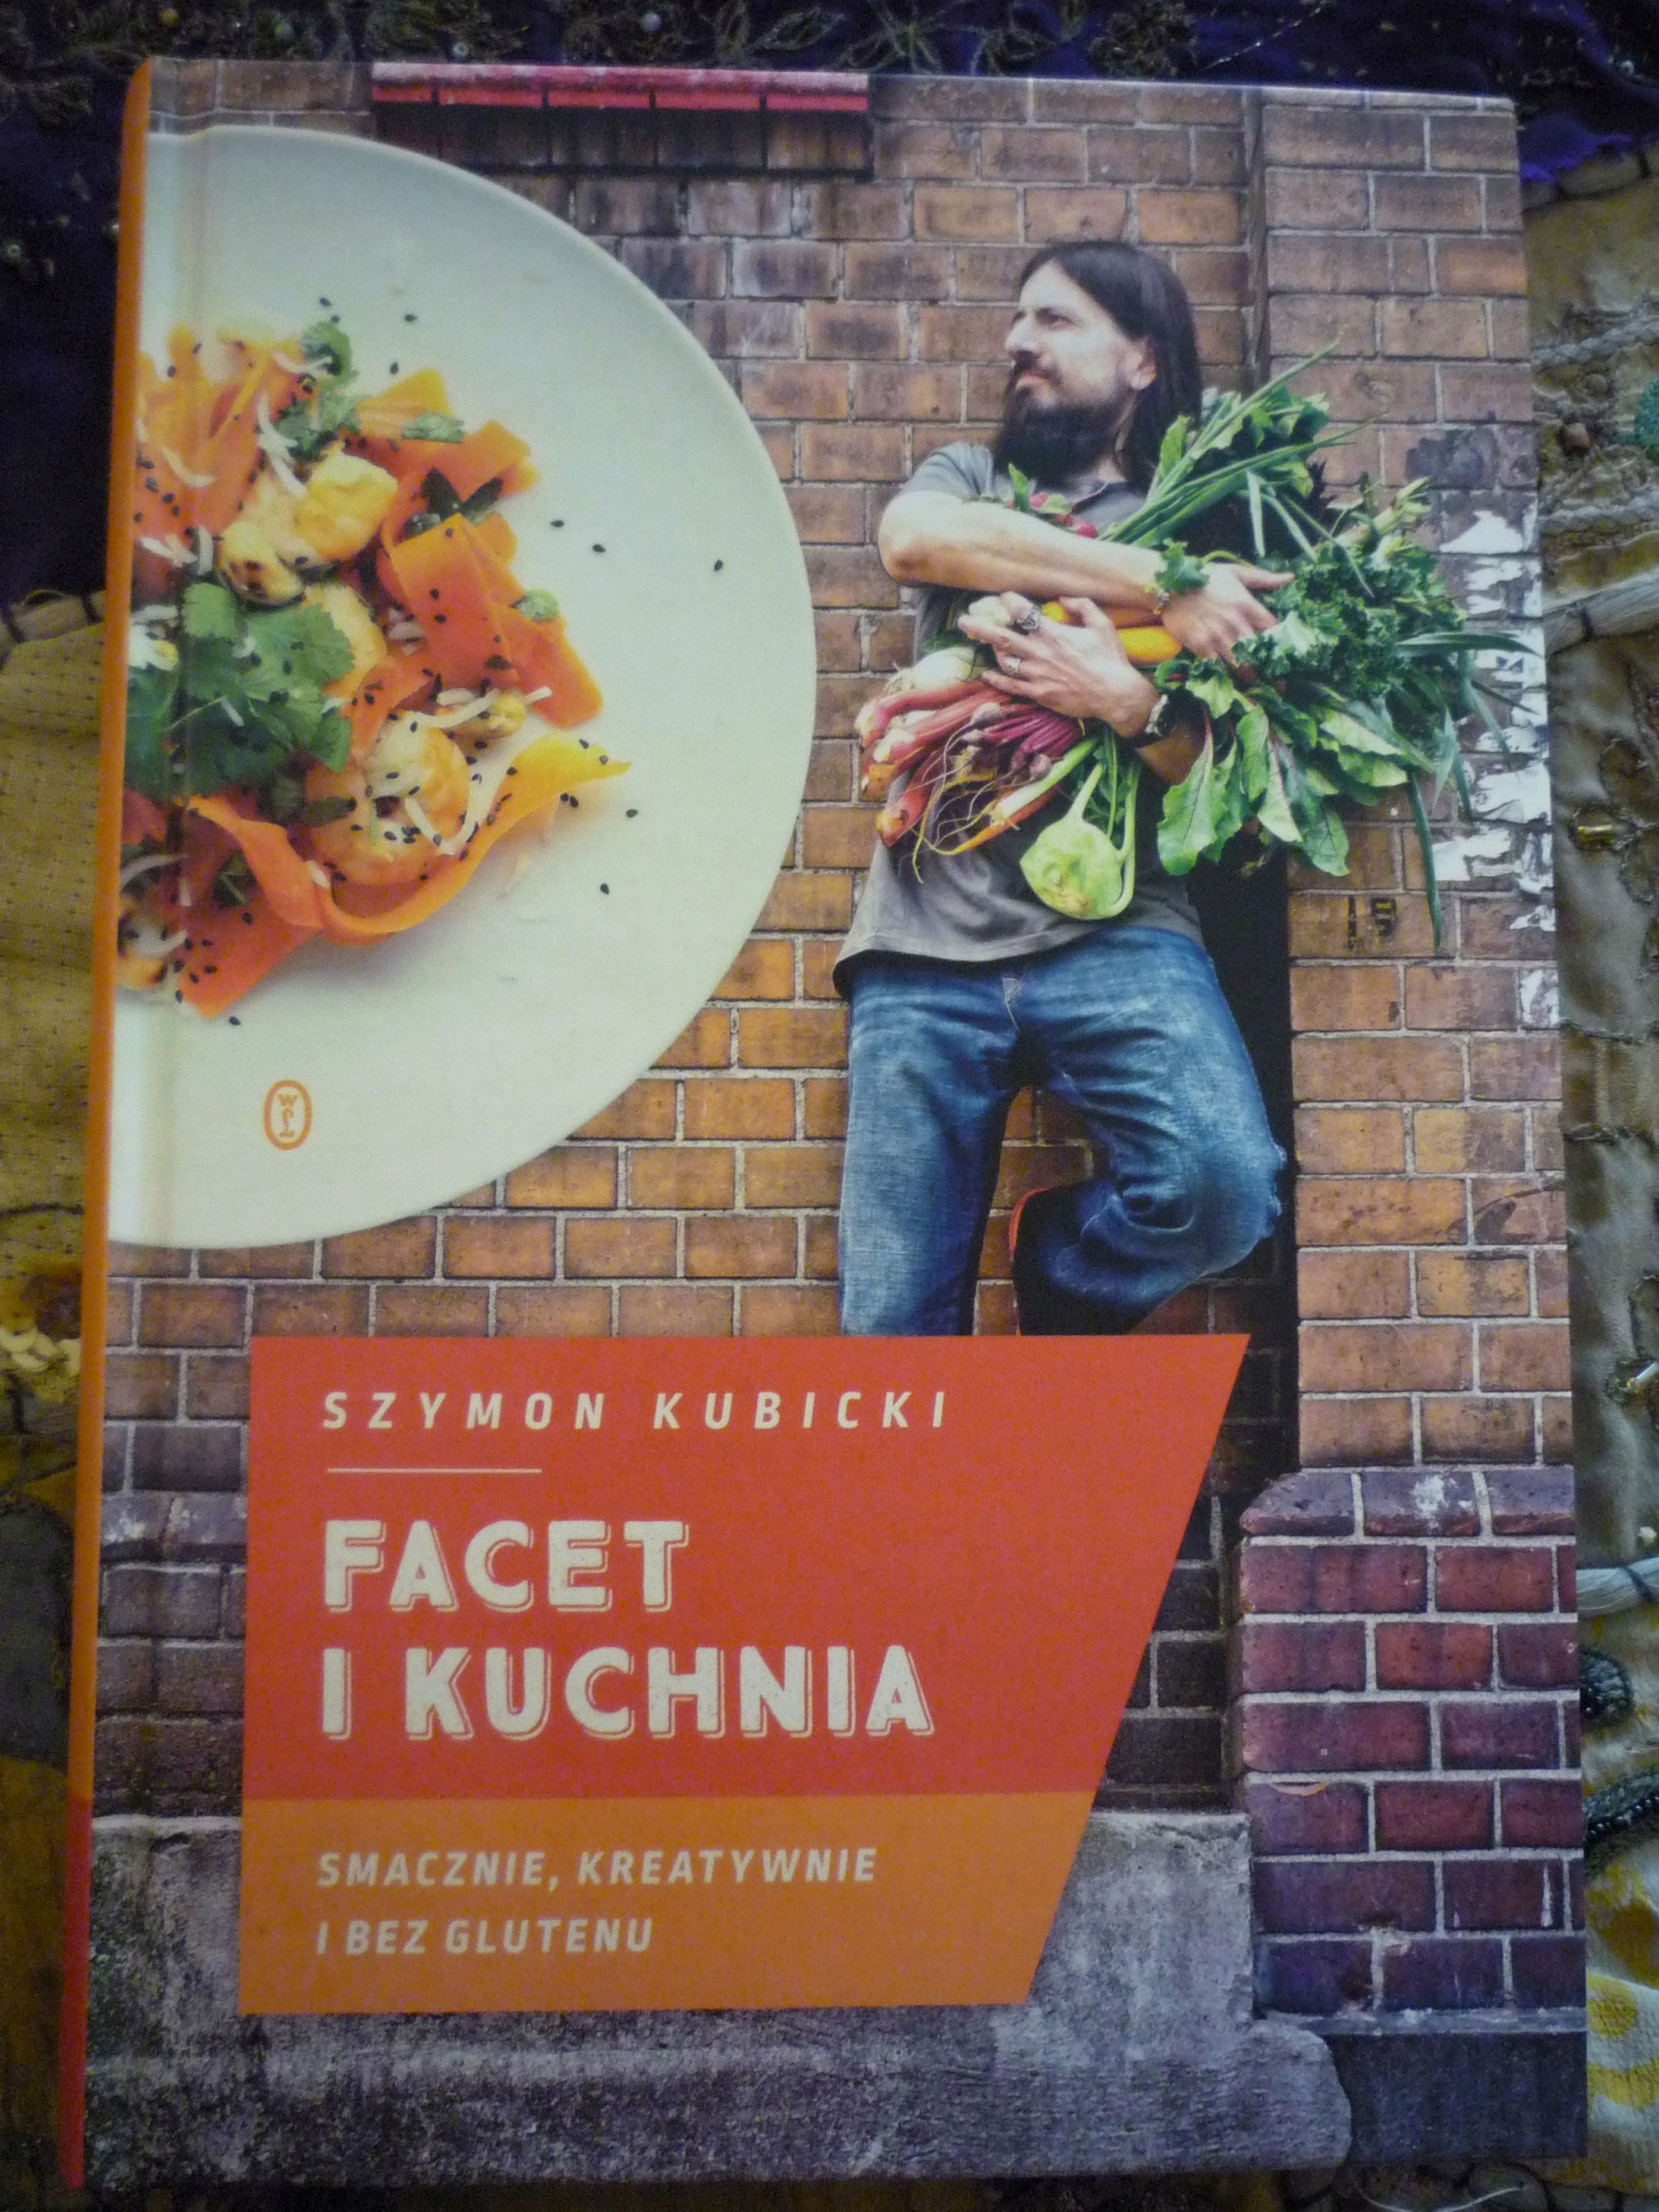 Szymon Kubicki Facet I Kuchnia